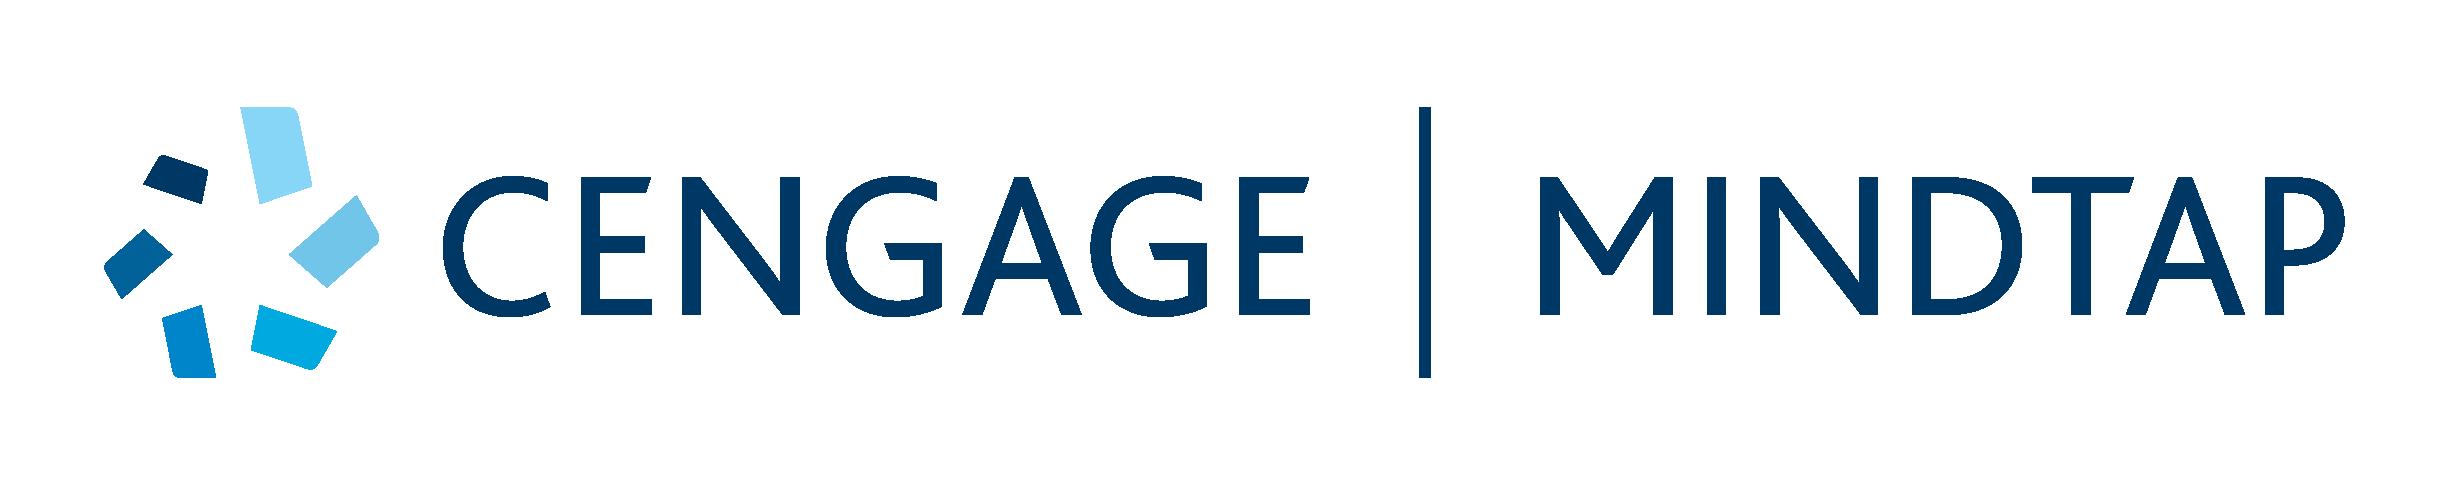 MindTap_Logo-resize267x89